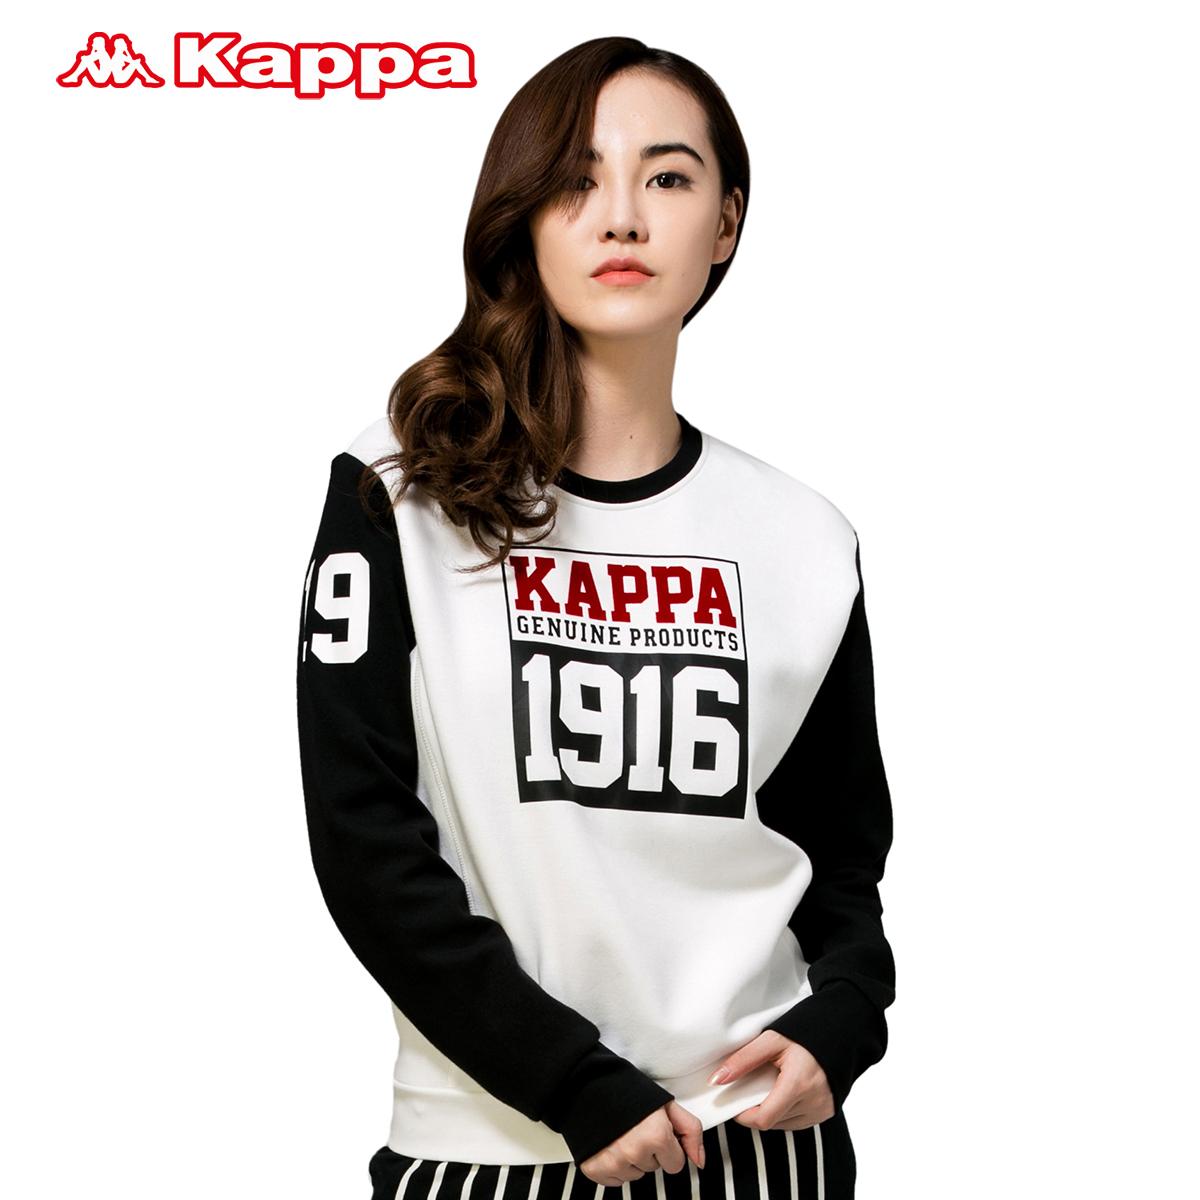 Kappa女卫衣 运动服休闲长袖上衣圆领图案套头衫 K战衣|K0562WT30